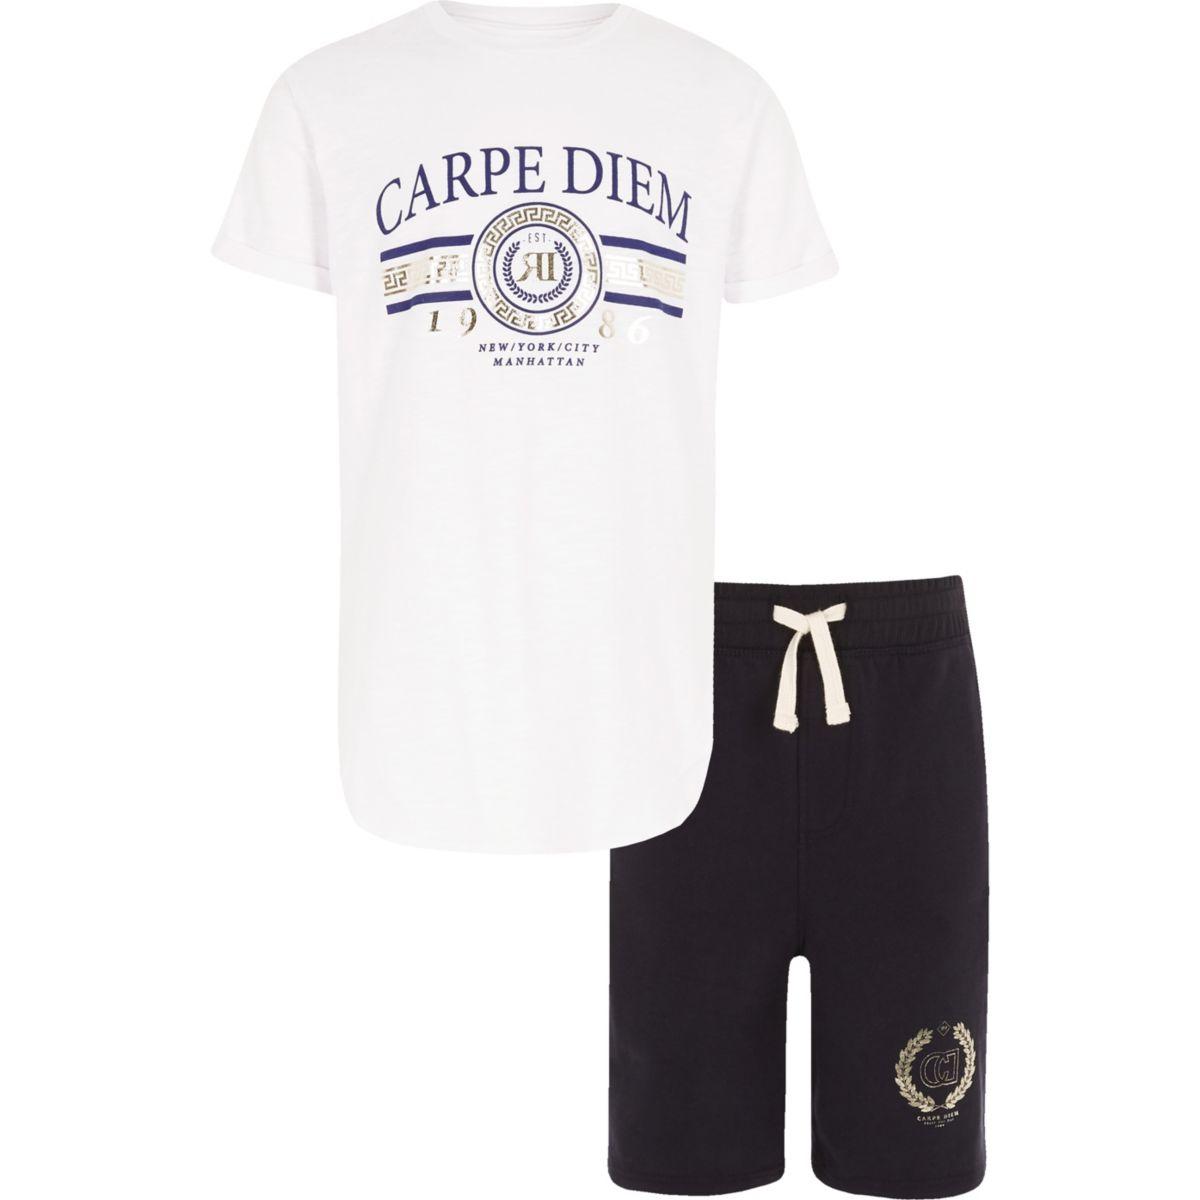 Boys 'carpe diem' foil print T-shirt outfit